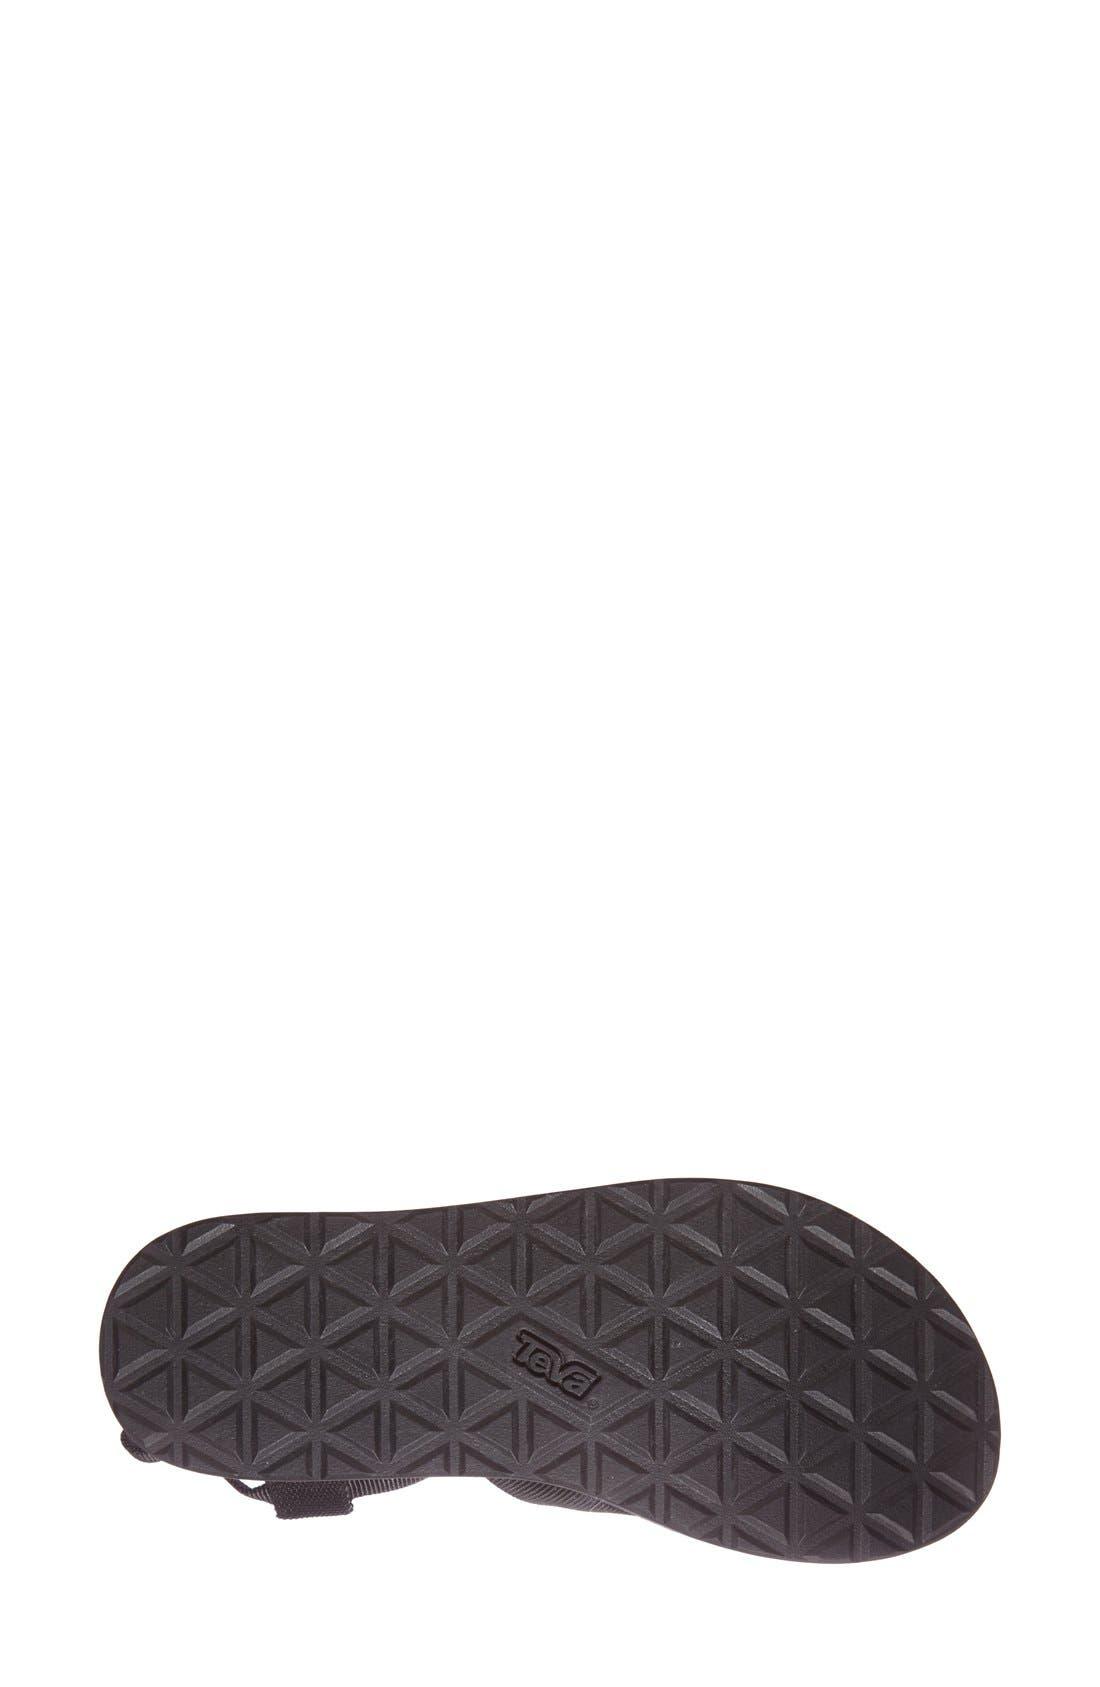 TEVA,                             'Original' Flatform Sandal,                             Alternate thumbnail 4, color,                             001